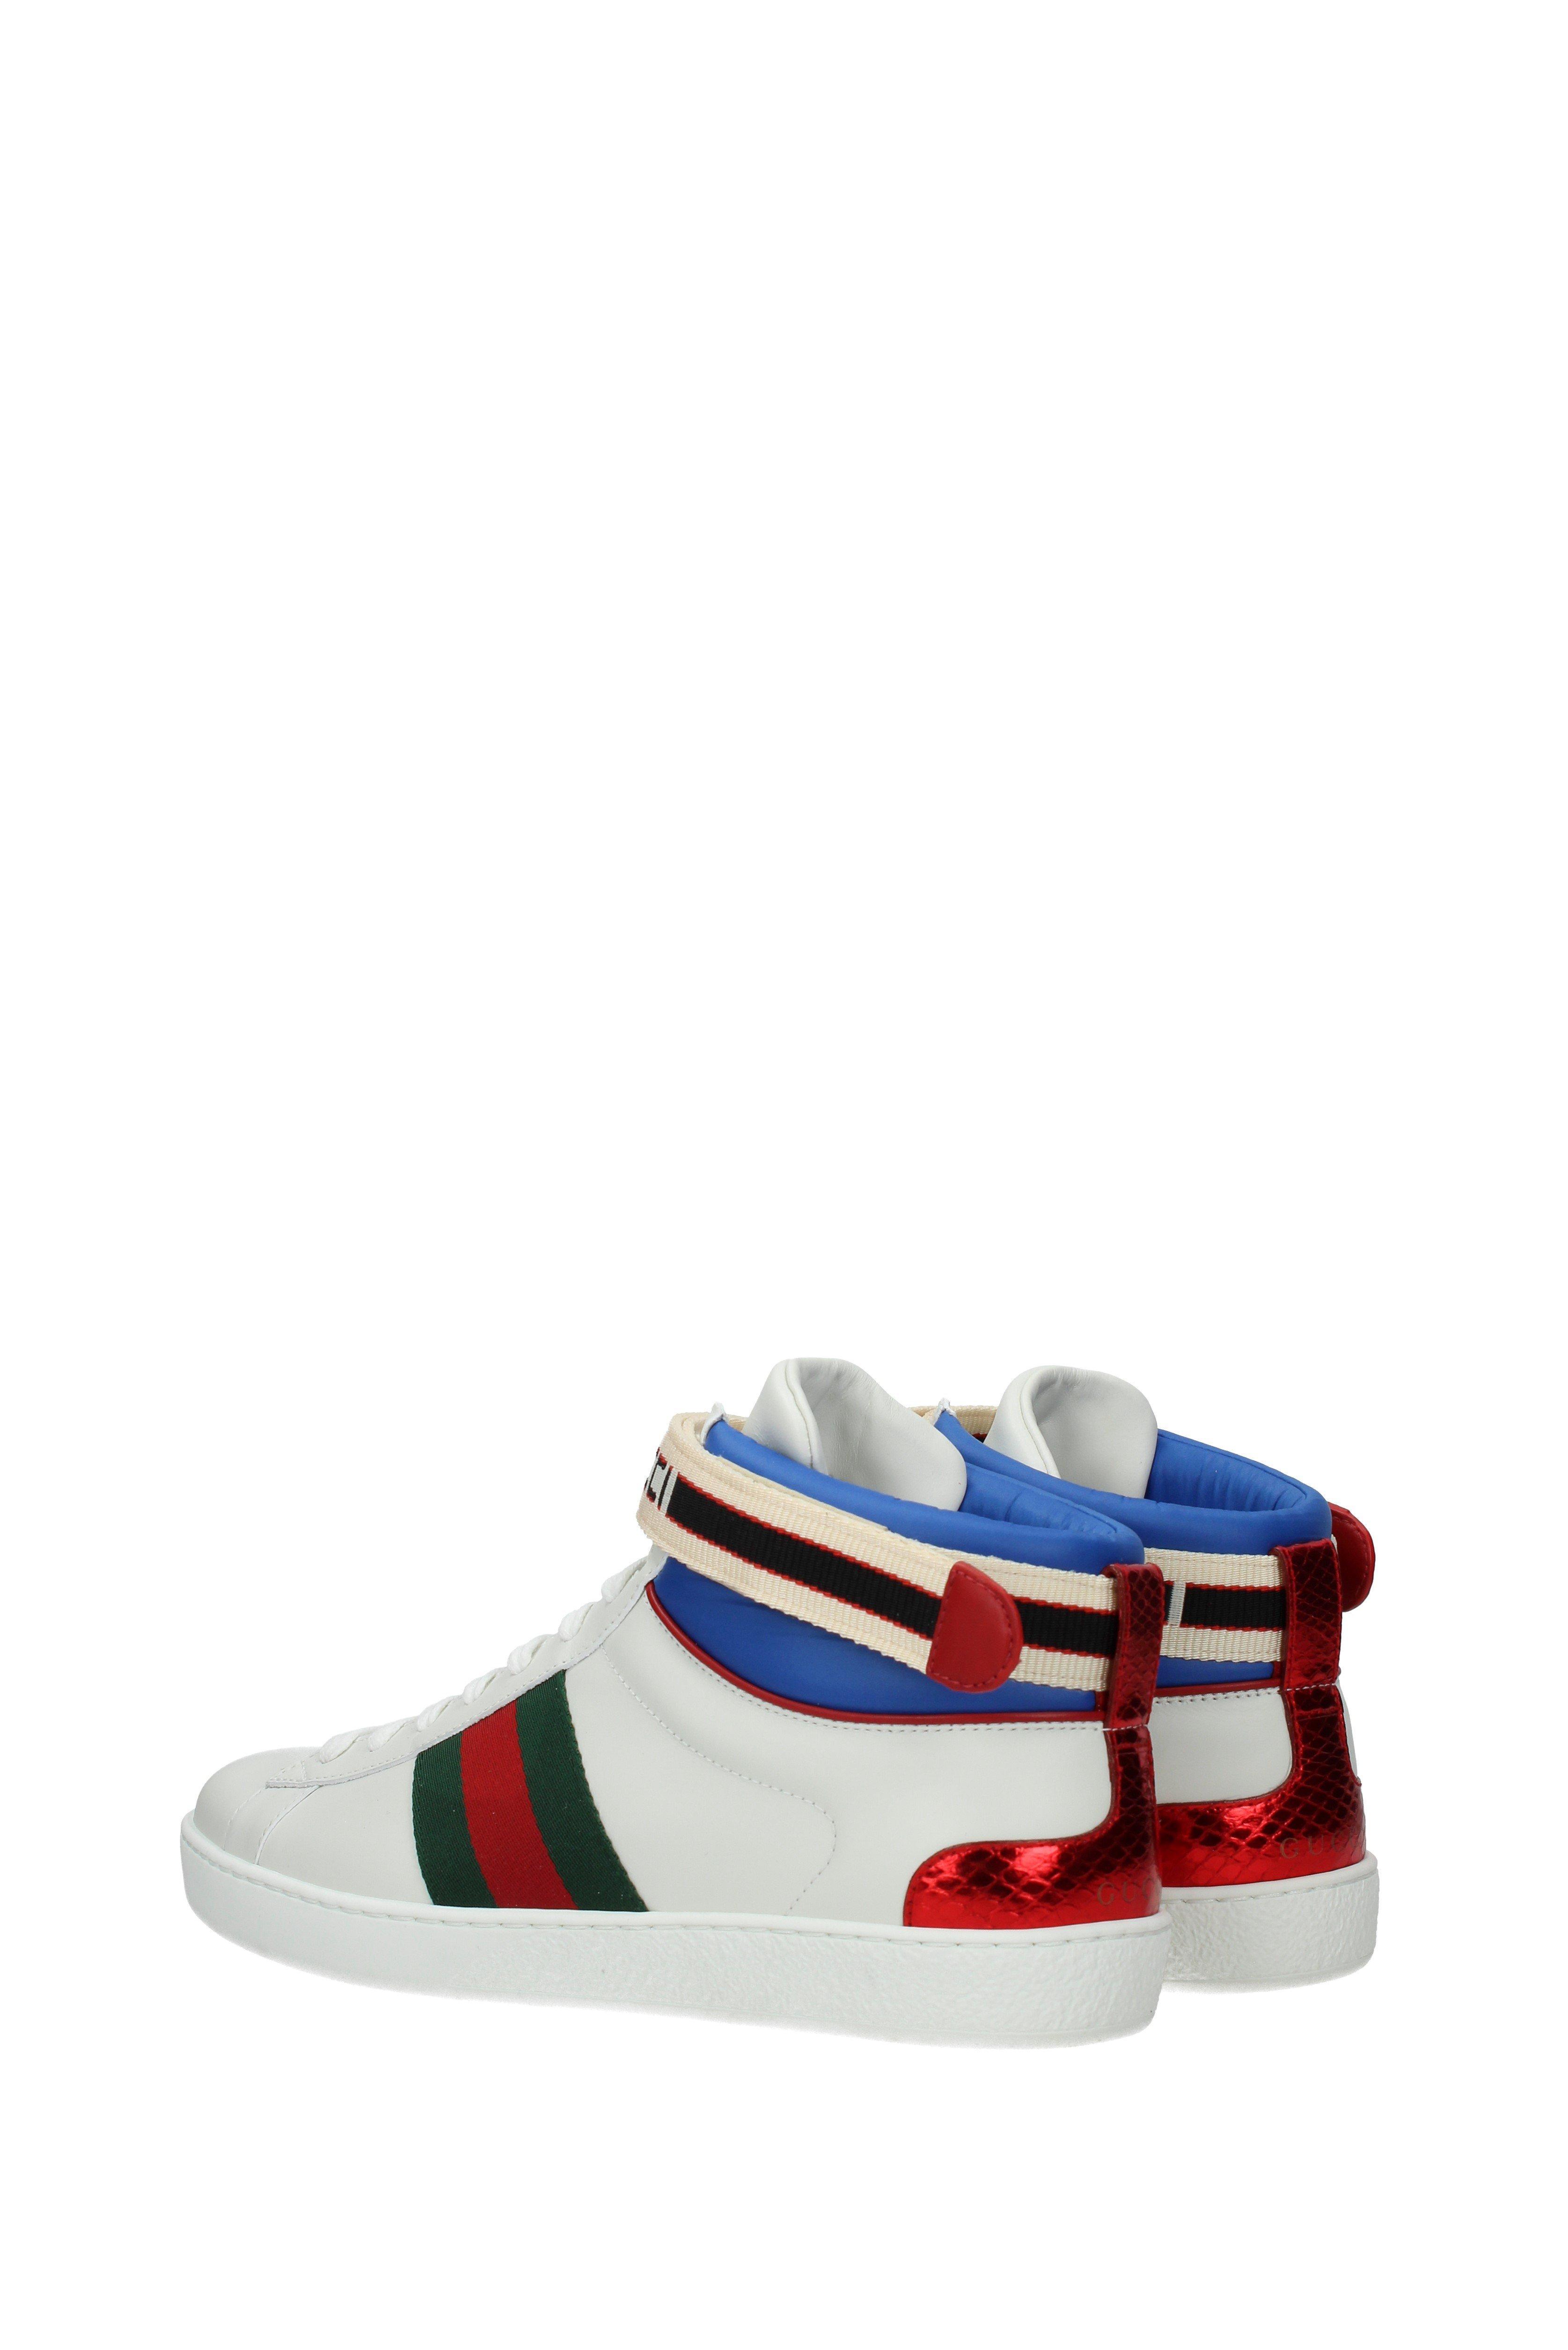 12327142fc6 Lyst - Gucci Sneakers Men White in White for Men